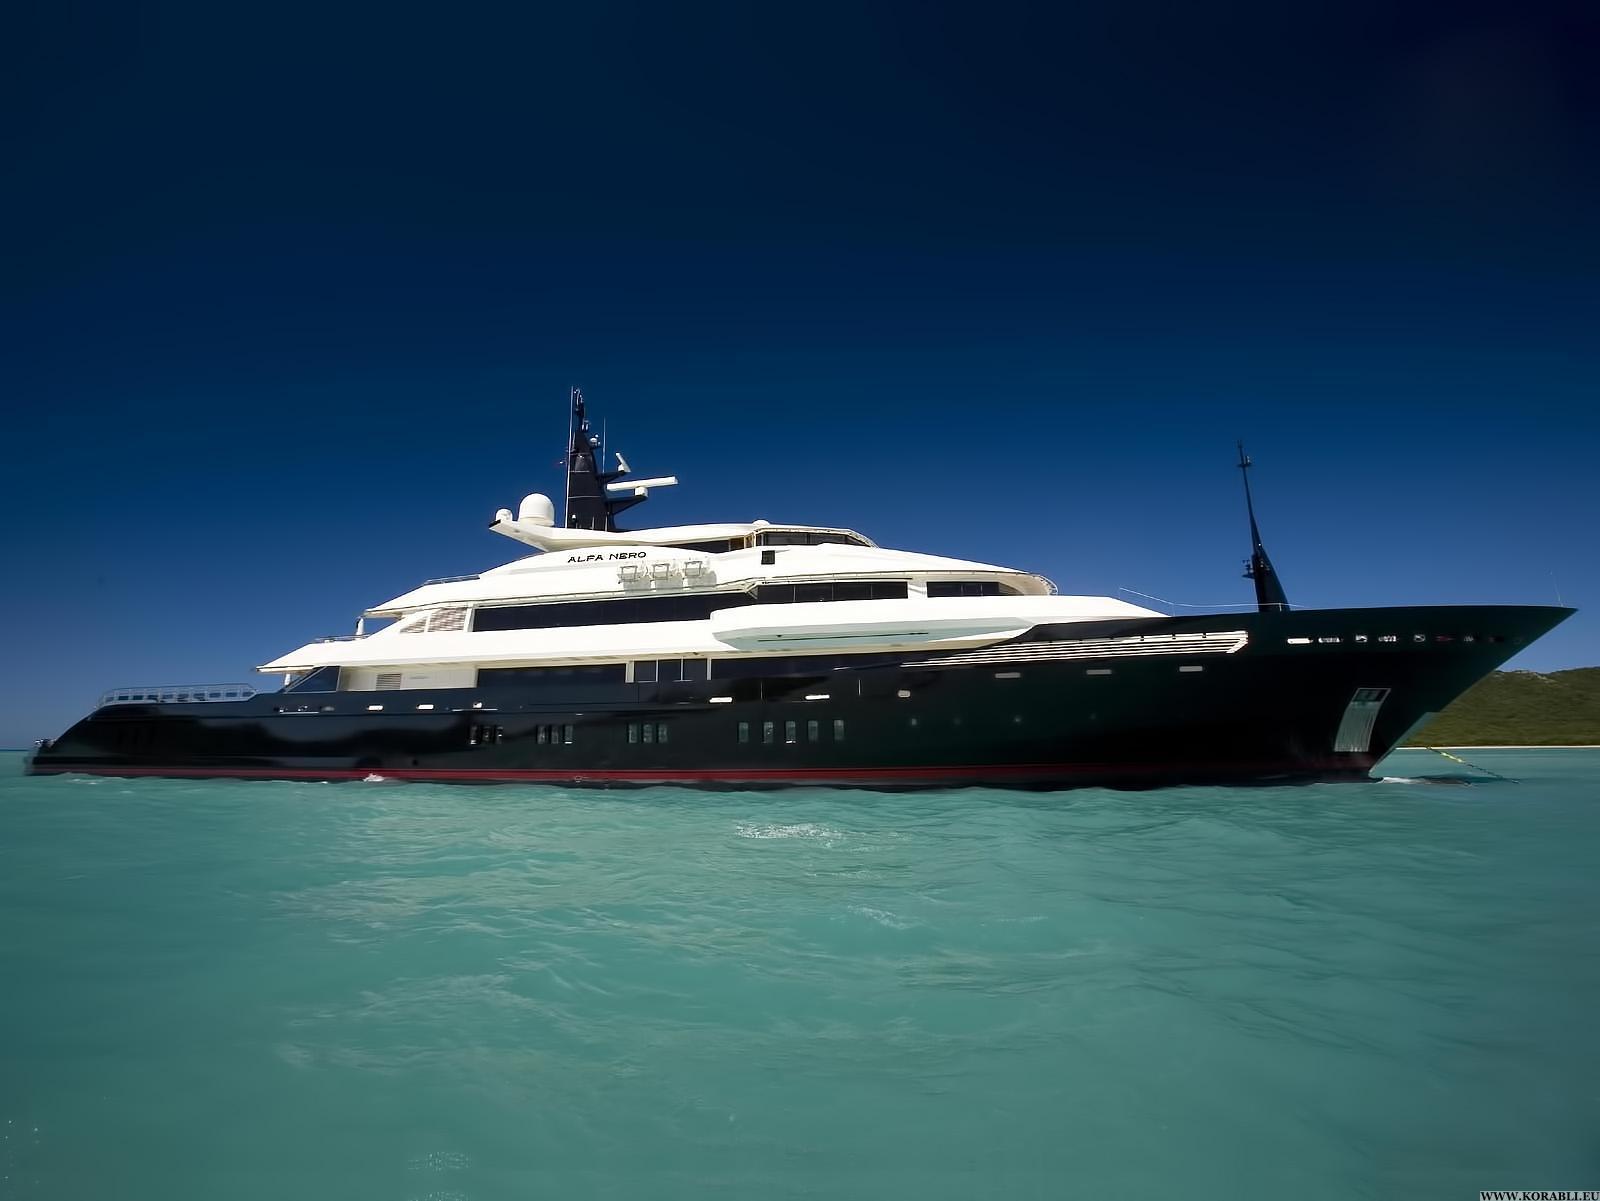 Alfa nero yacht charter details oceanco charterworld - Salon du yacht monaco ...